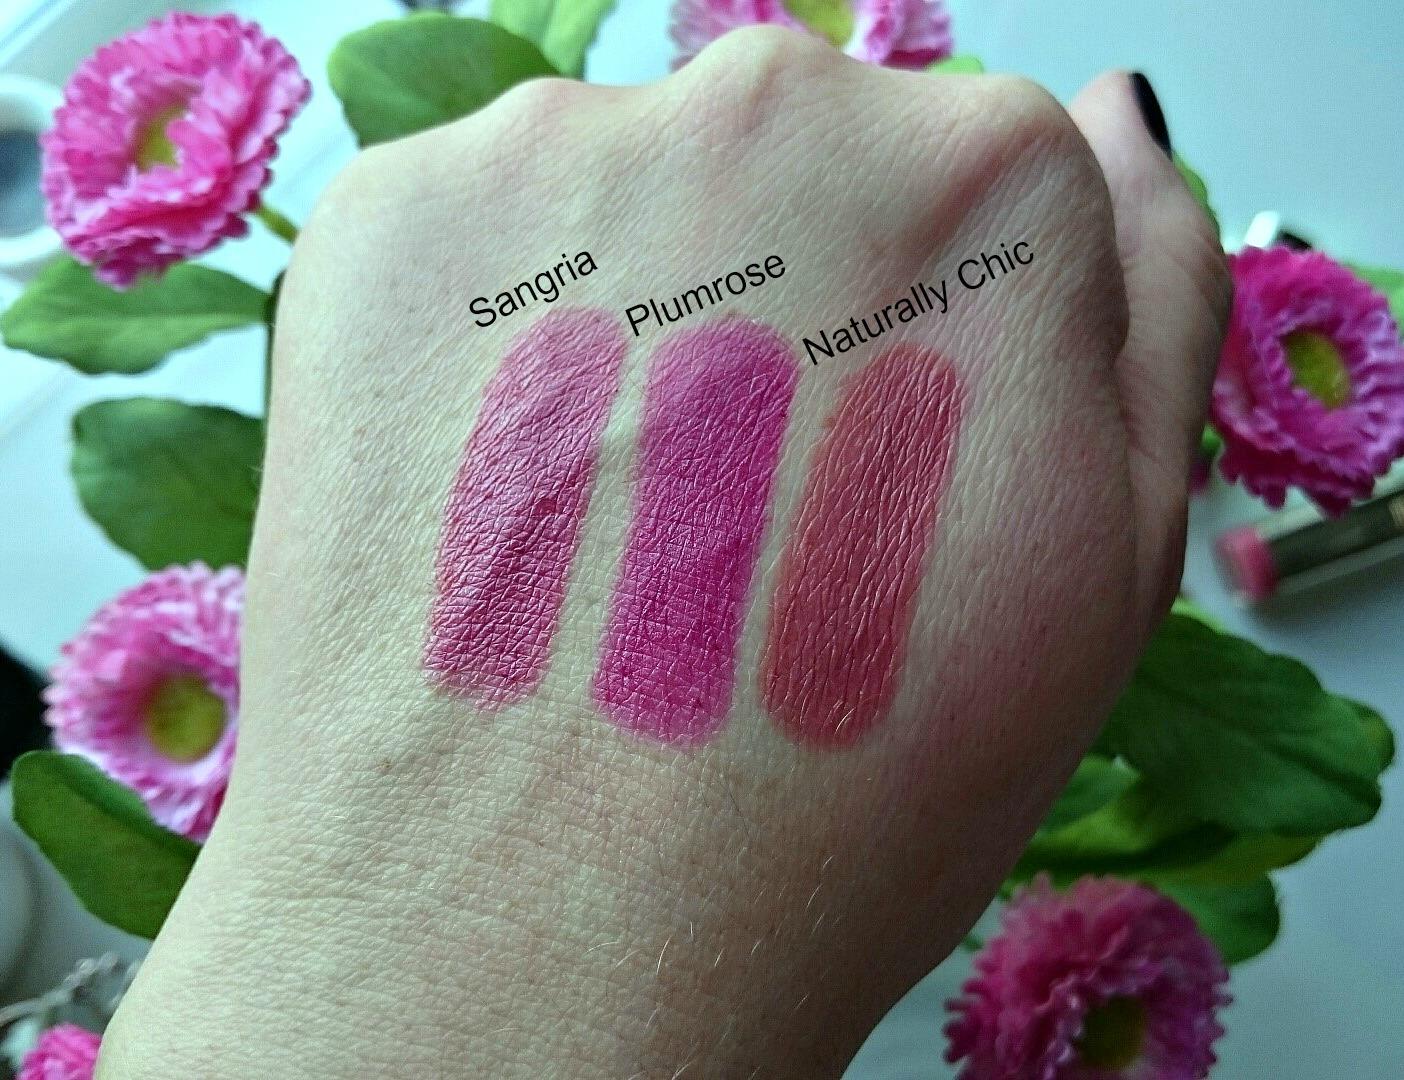 Milani Colour Statement Lipstick in Naturally Chic